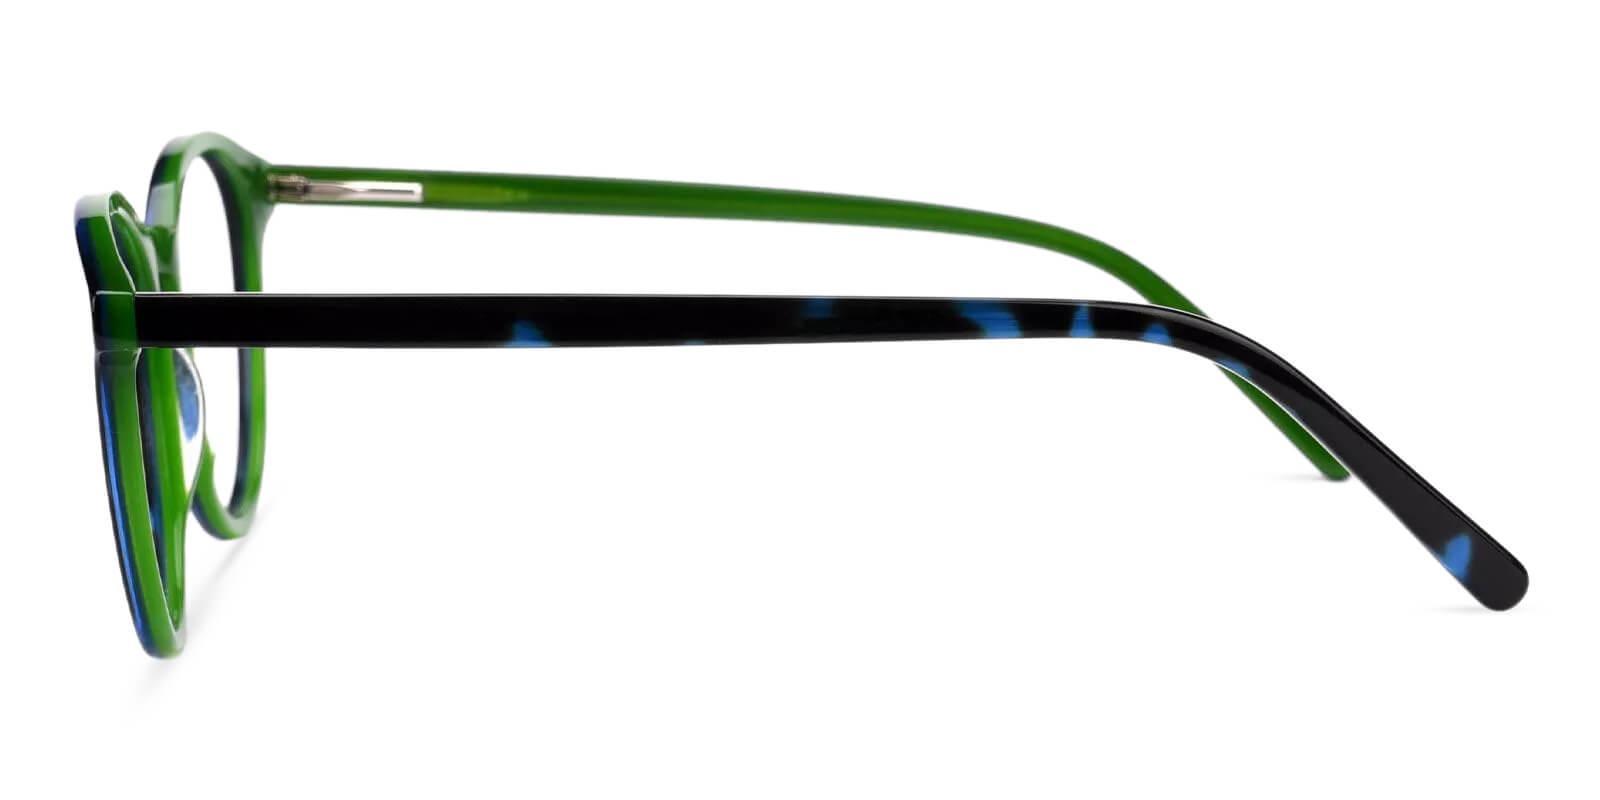 Tammy Green Acetate Eyeglasses , Fashion , SpringHinges , UniversalBridgeFit Frames from ABBE Glasses